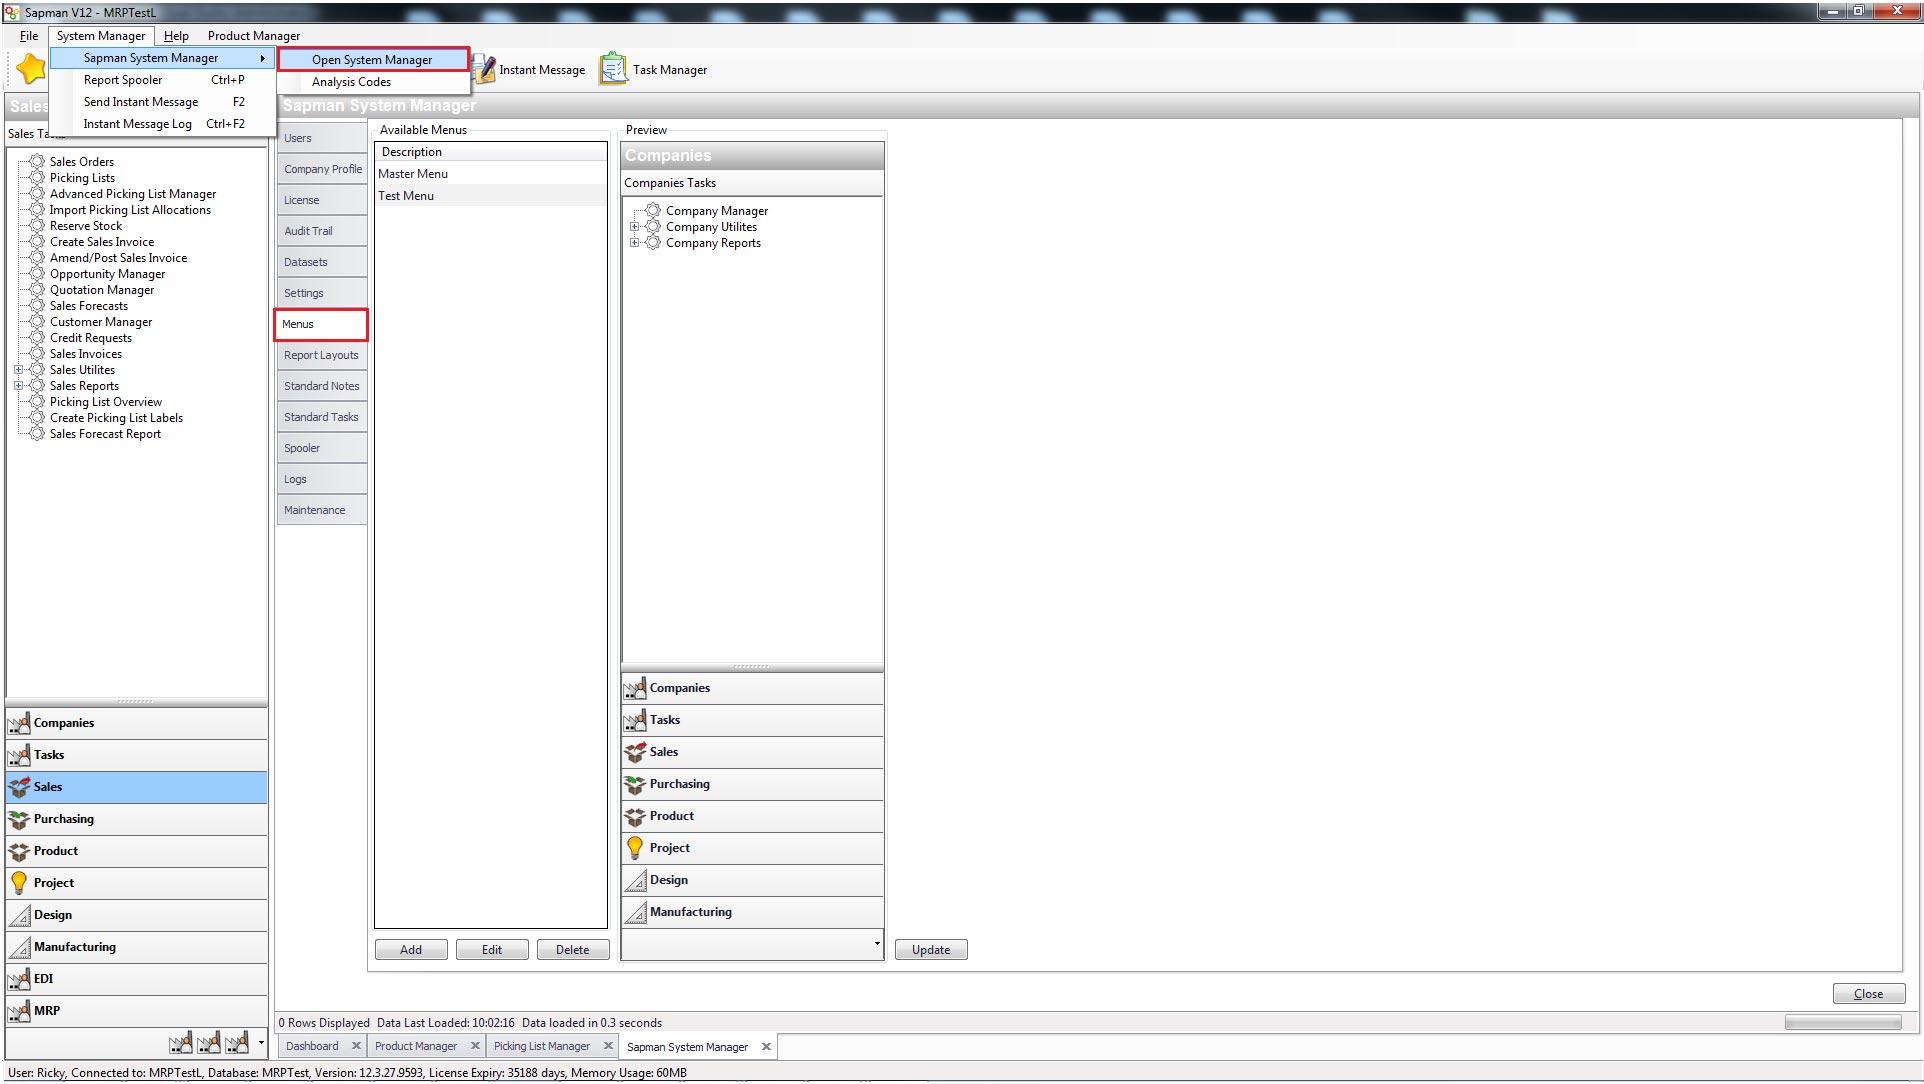 Sapman v12 System Manager screen